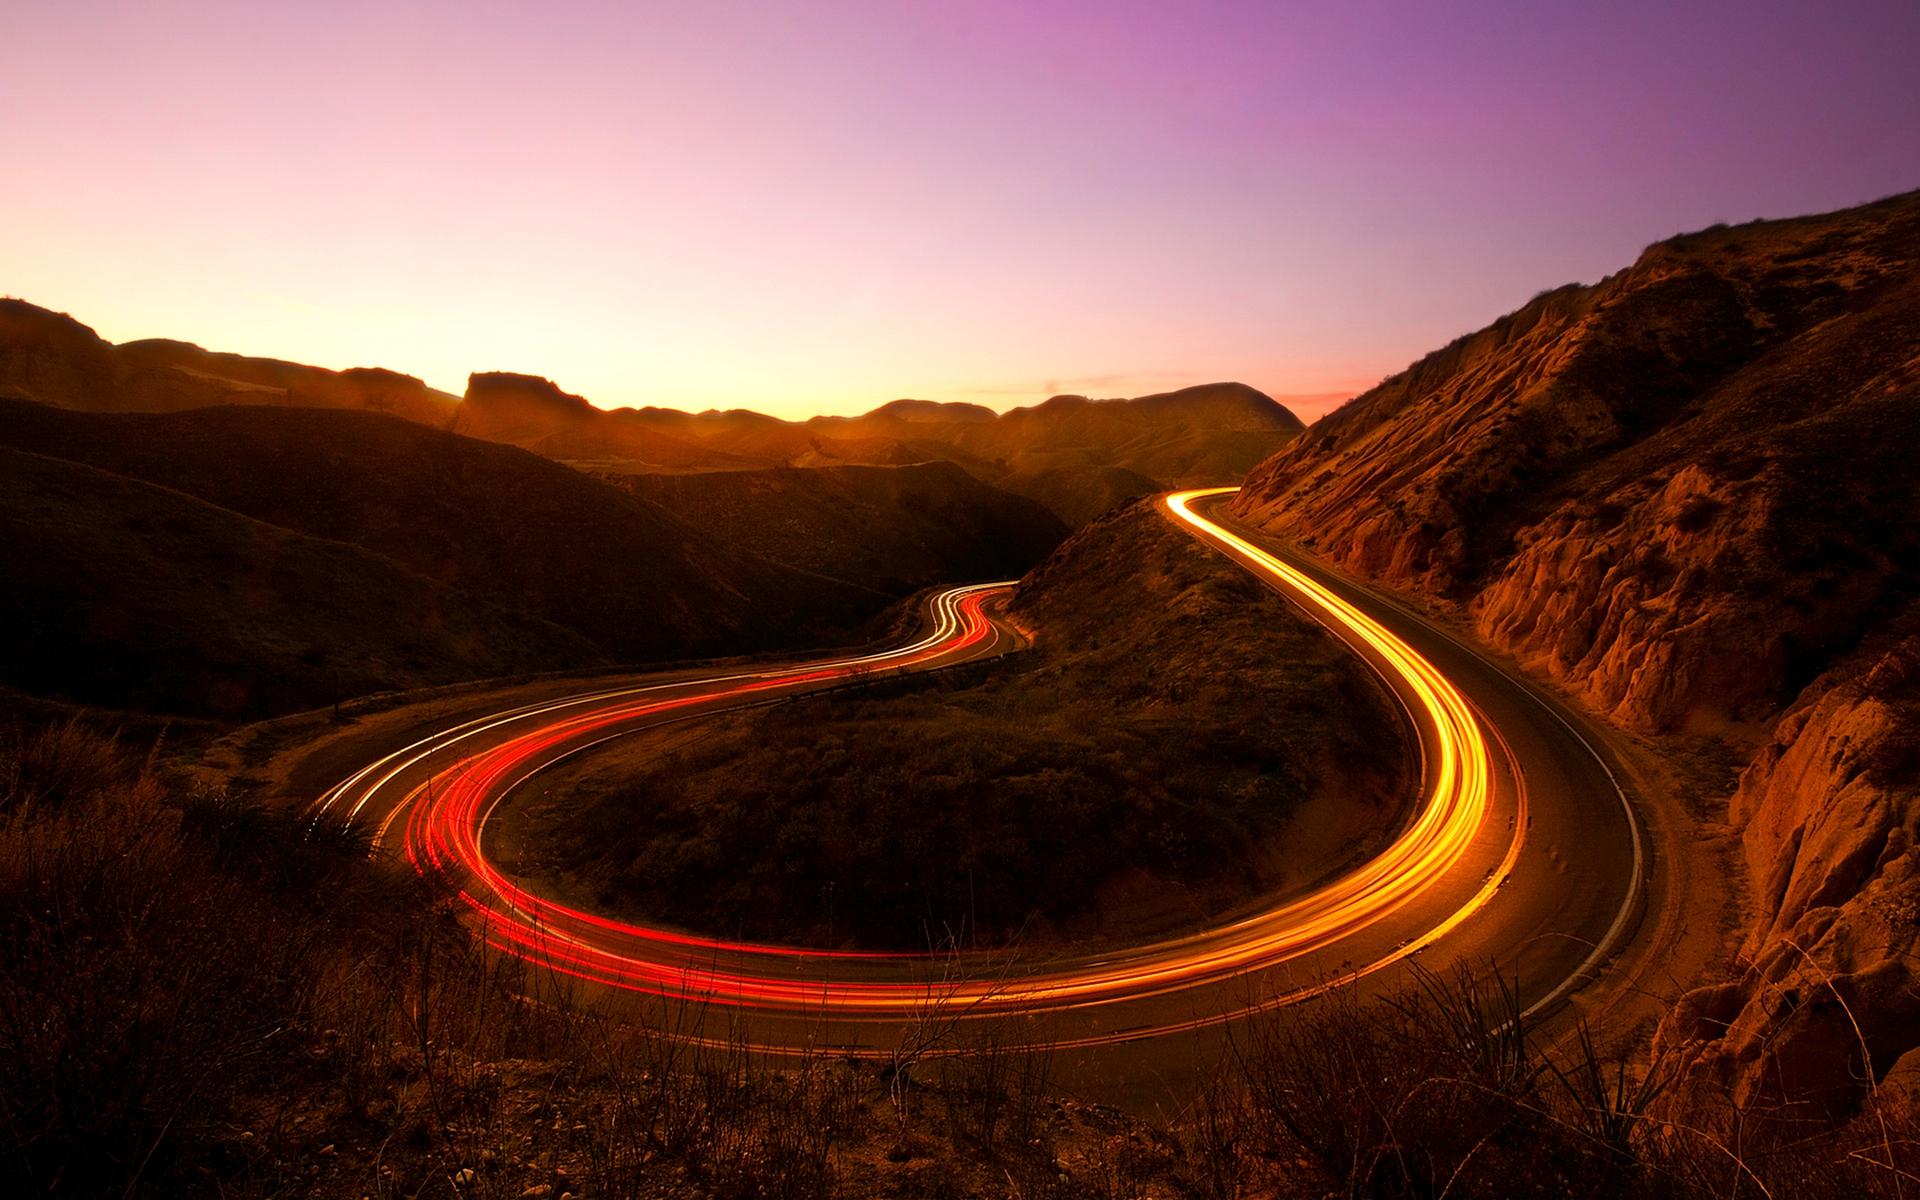 Sunset Lights Canyon